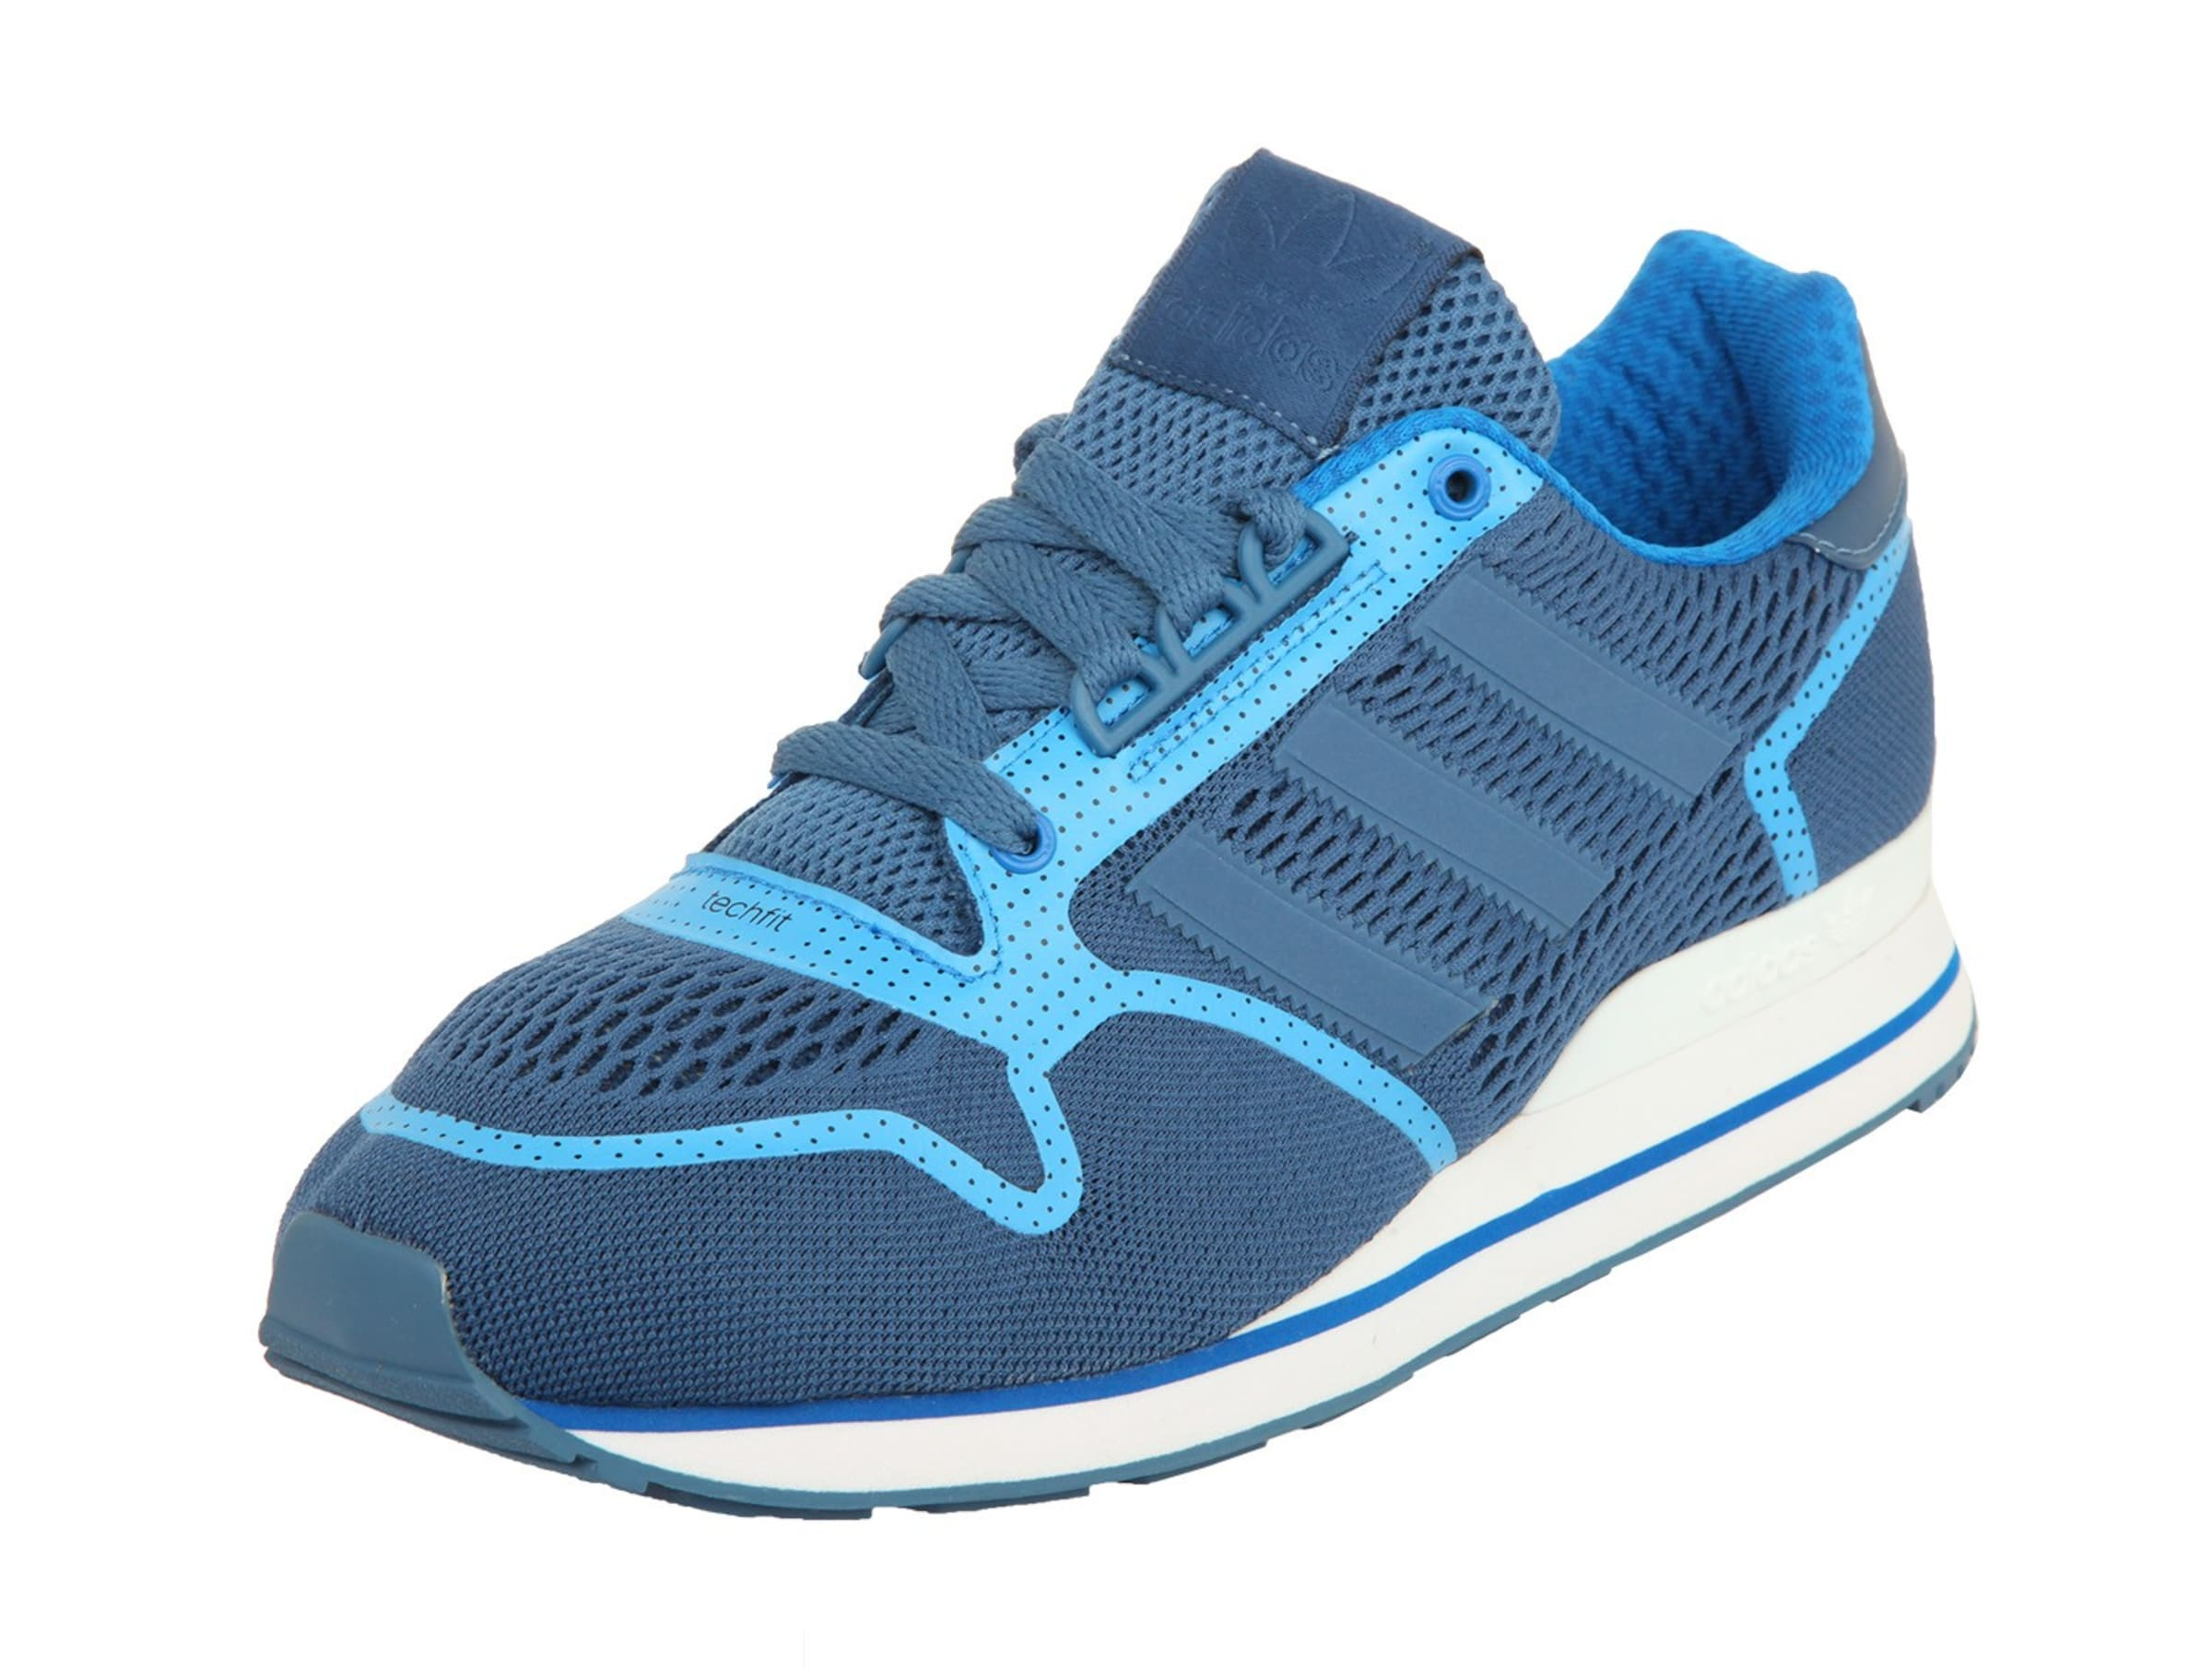 ADIDAS PERFORMANCE Sneakers ZX 500 TECH FIT in sportlichem Design M19299